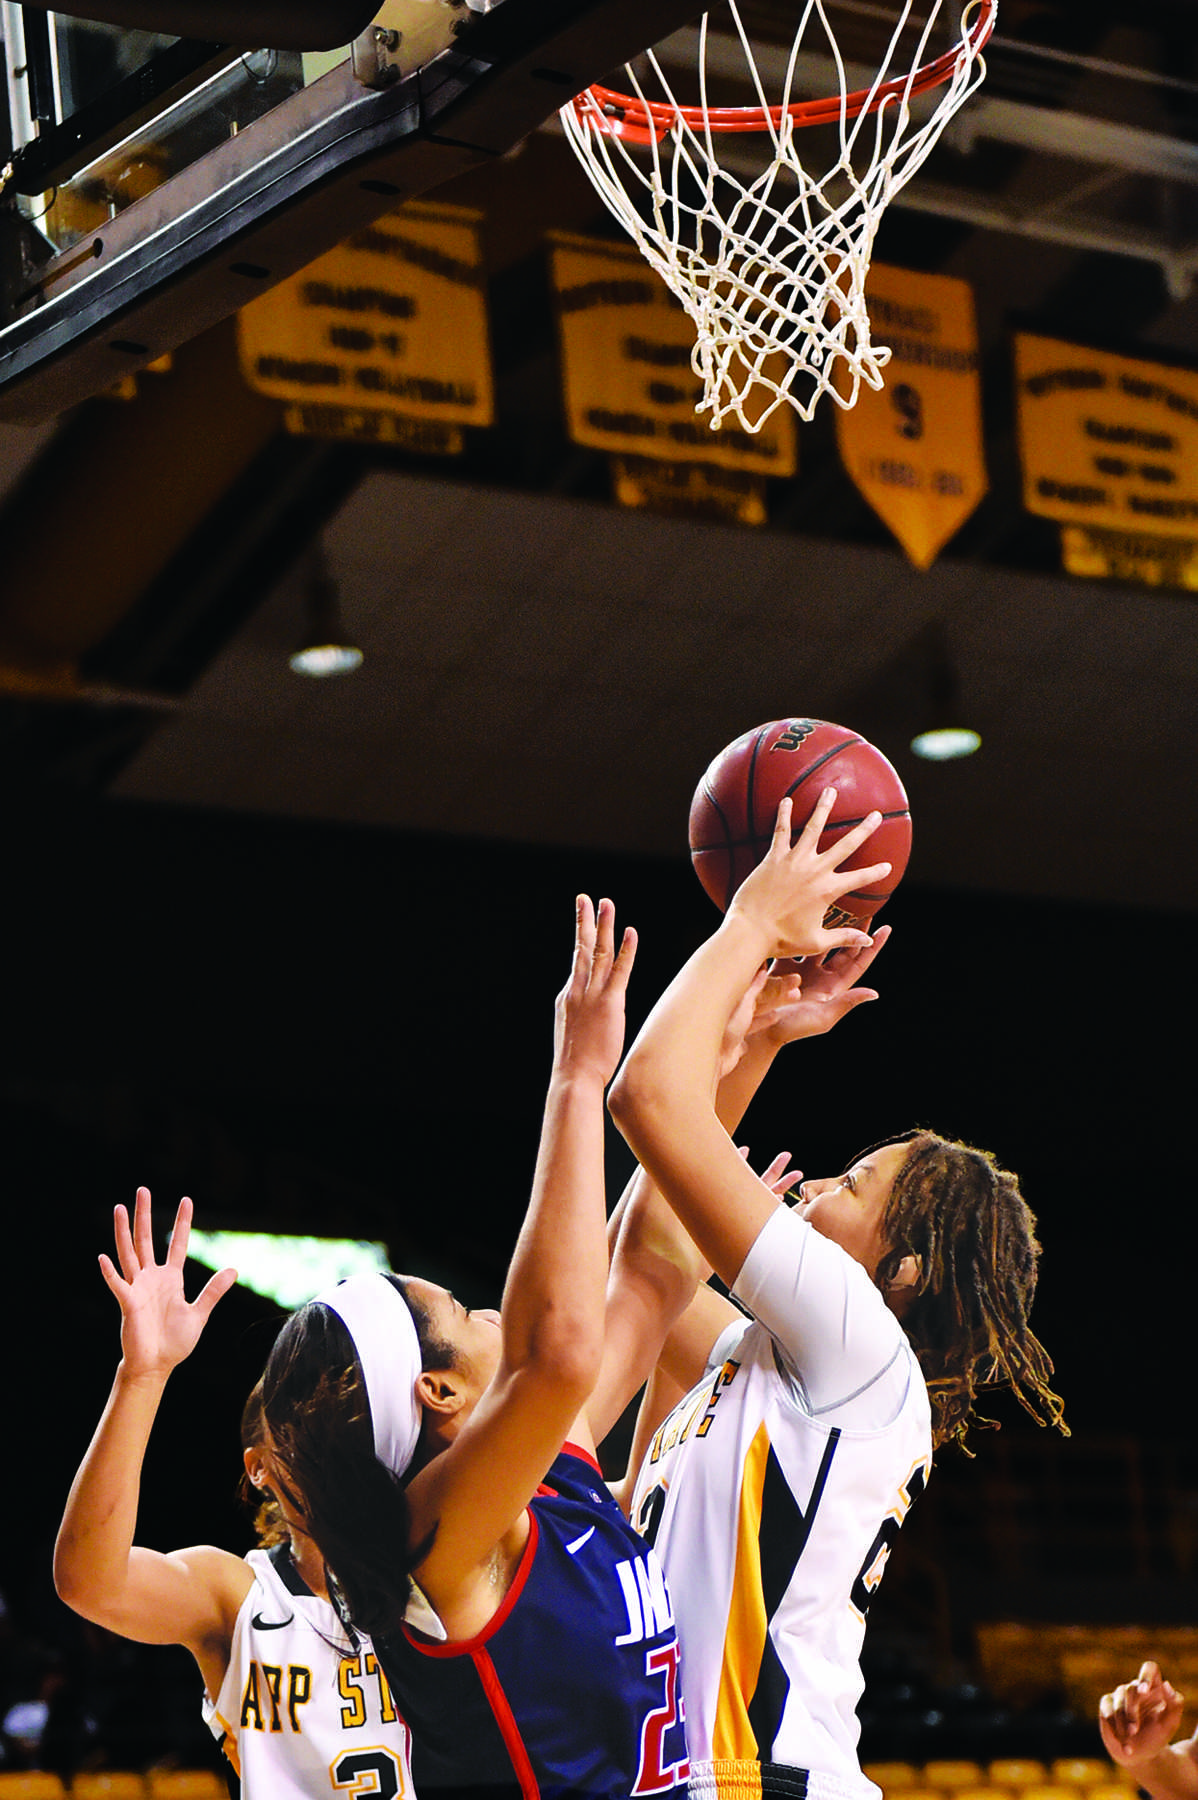 omens basketball ros gallery - HD1198×1800